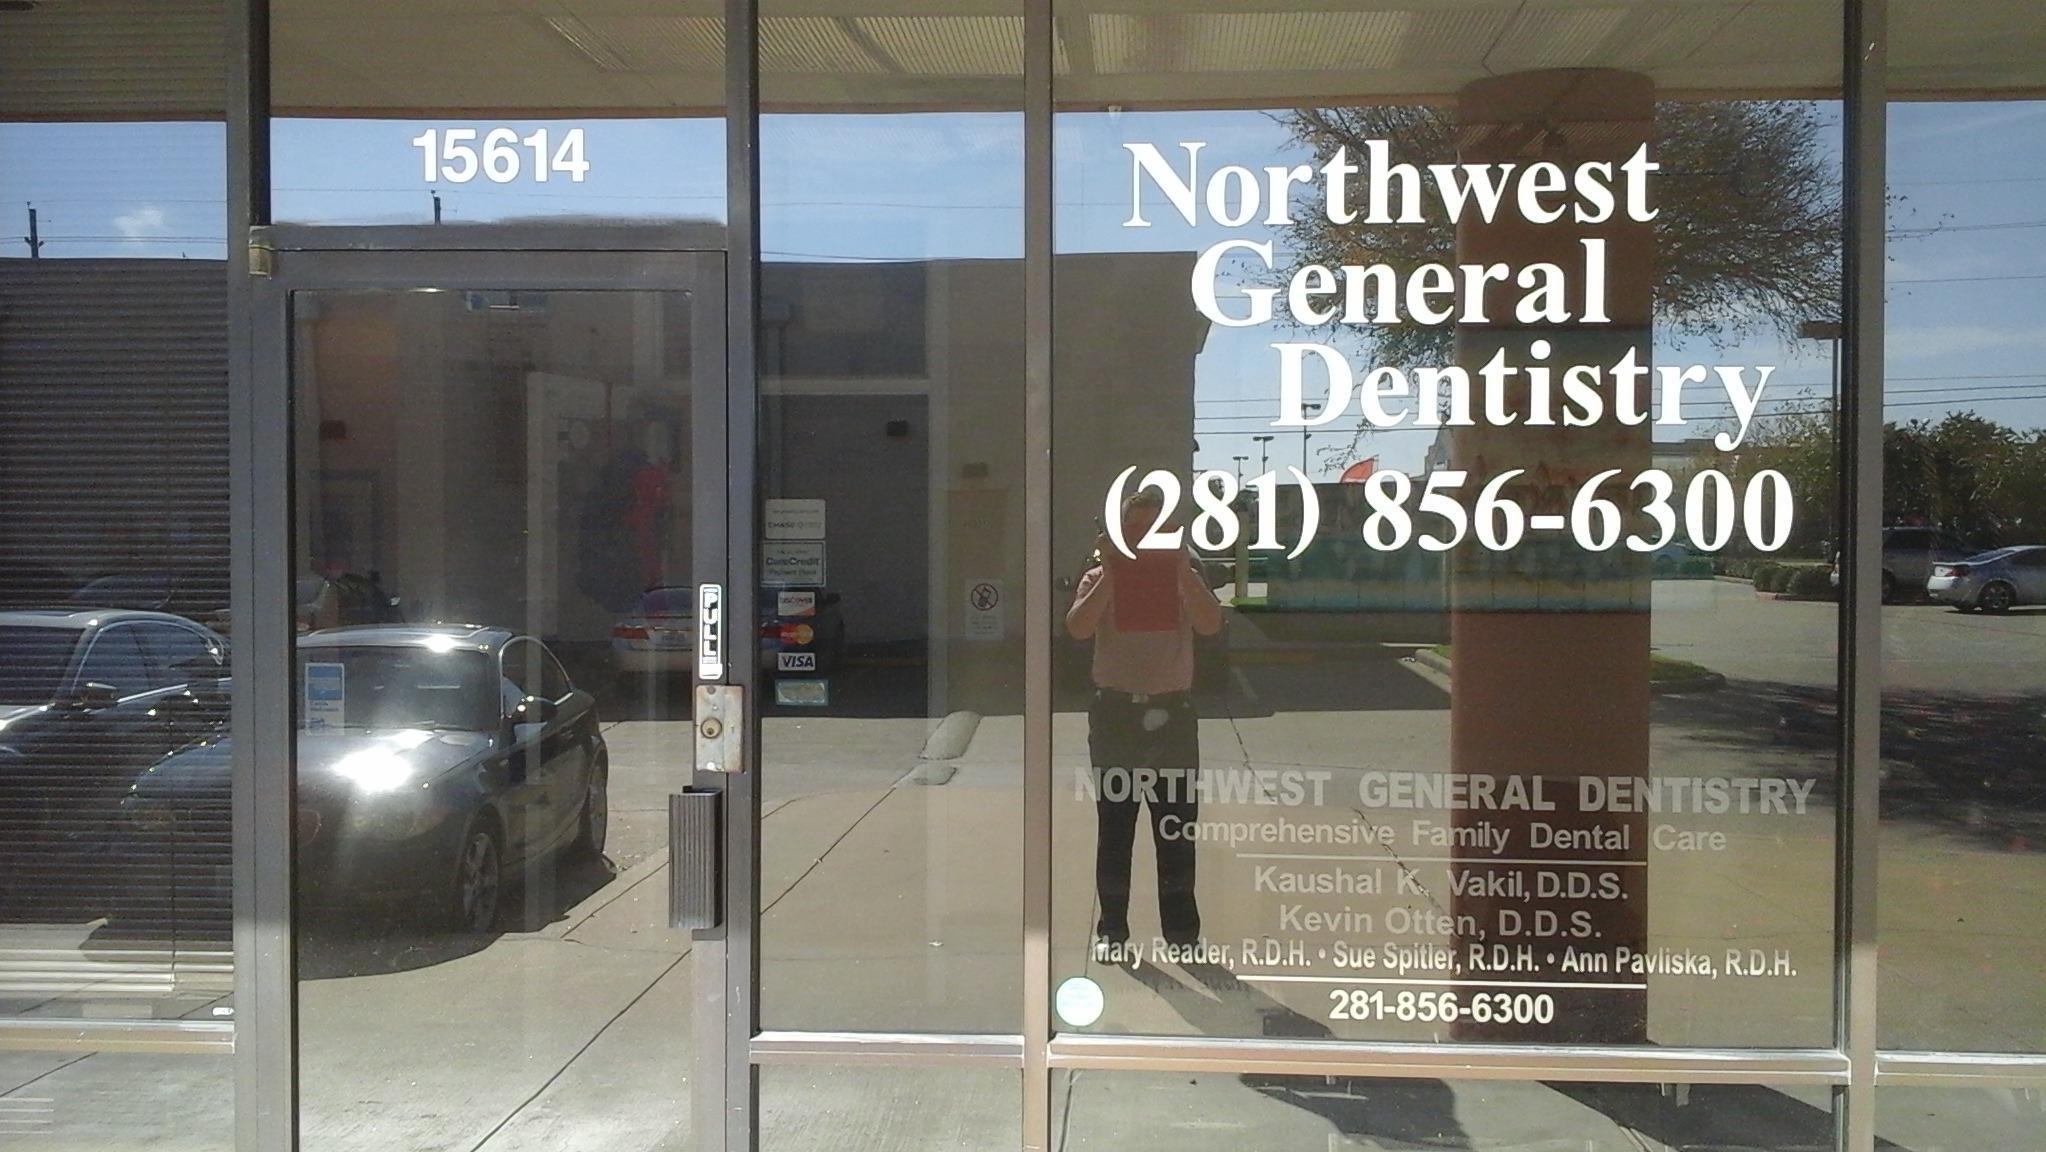 Northwest General Dentistry image 2